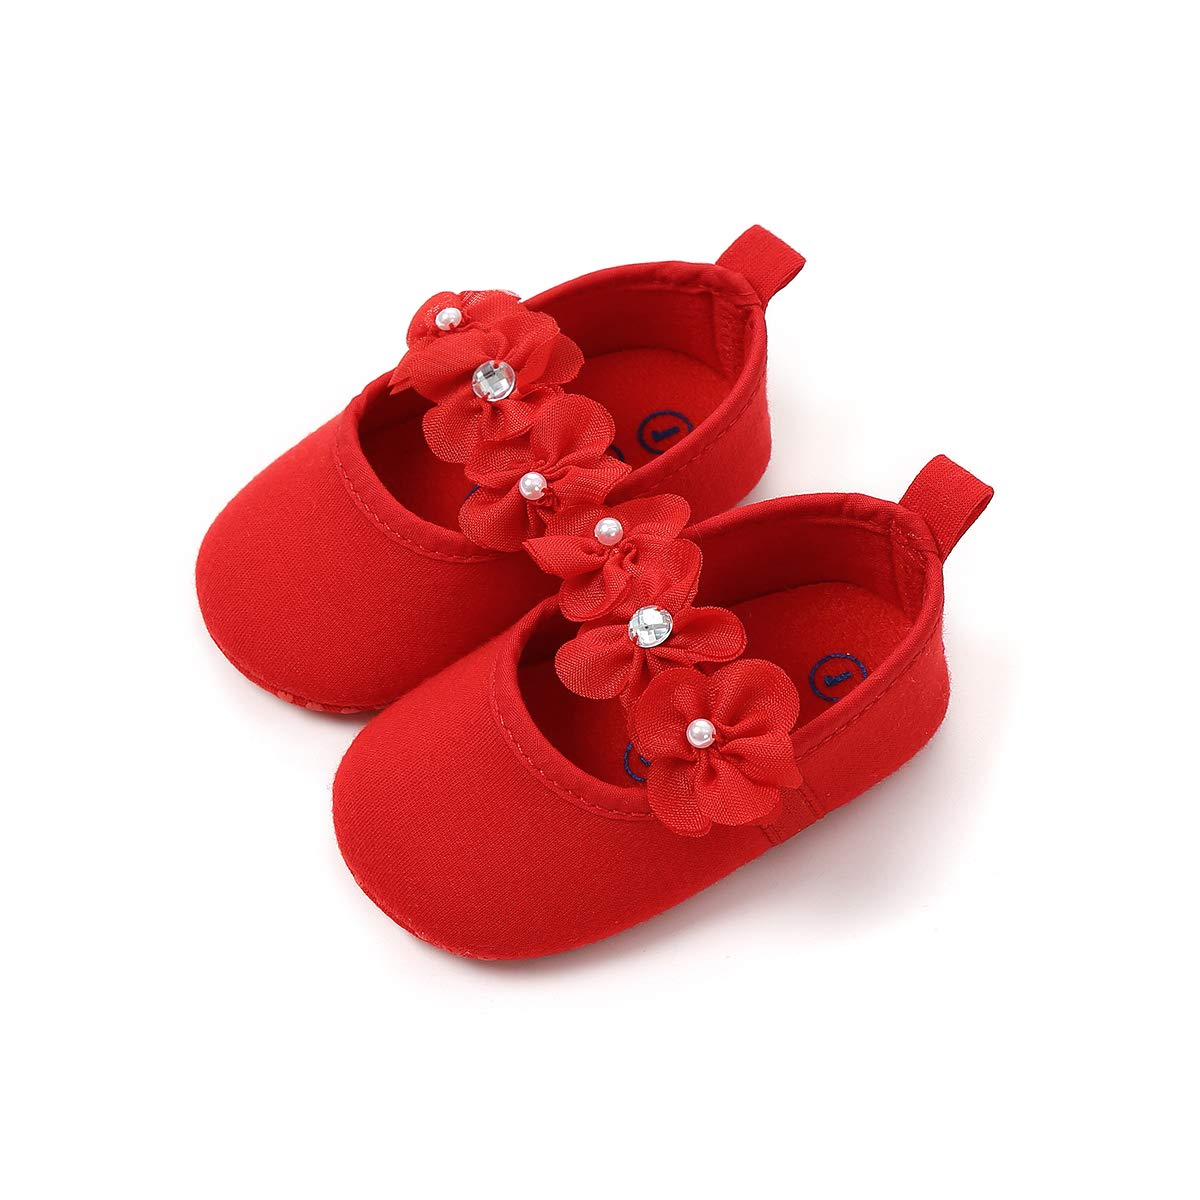 Sabe Baby Girls Floral Summer Dress Wedding Shoes Non-Slip Soft Leather Sole Sandals Elegant Formal 6-12 Months